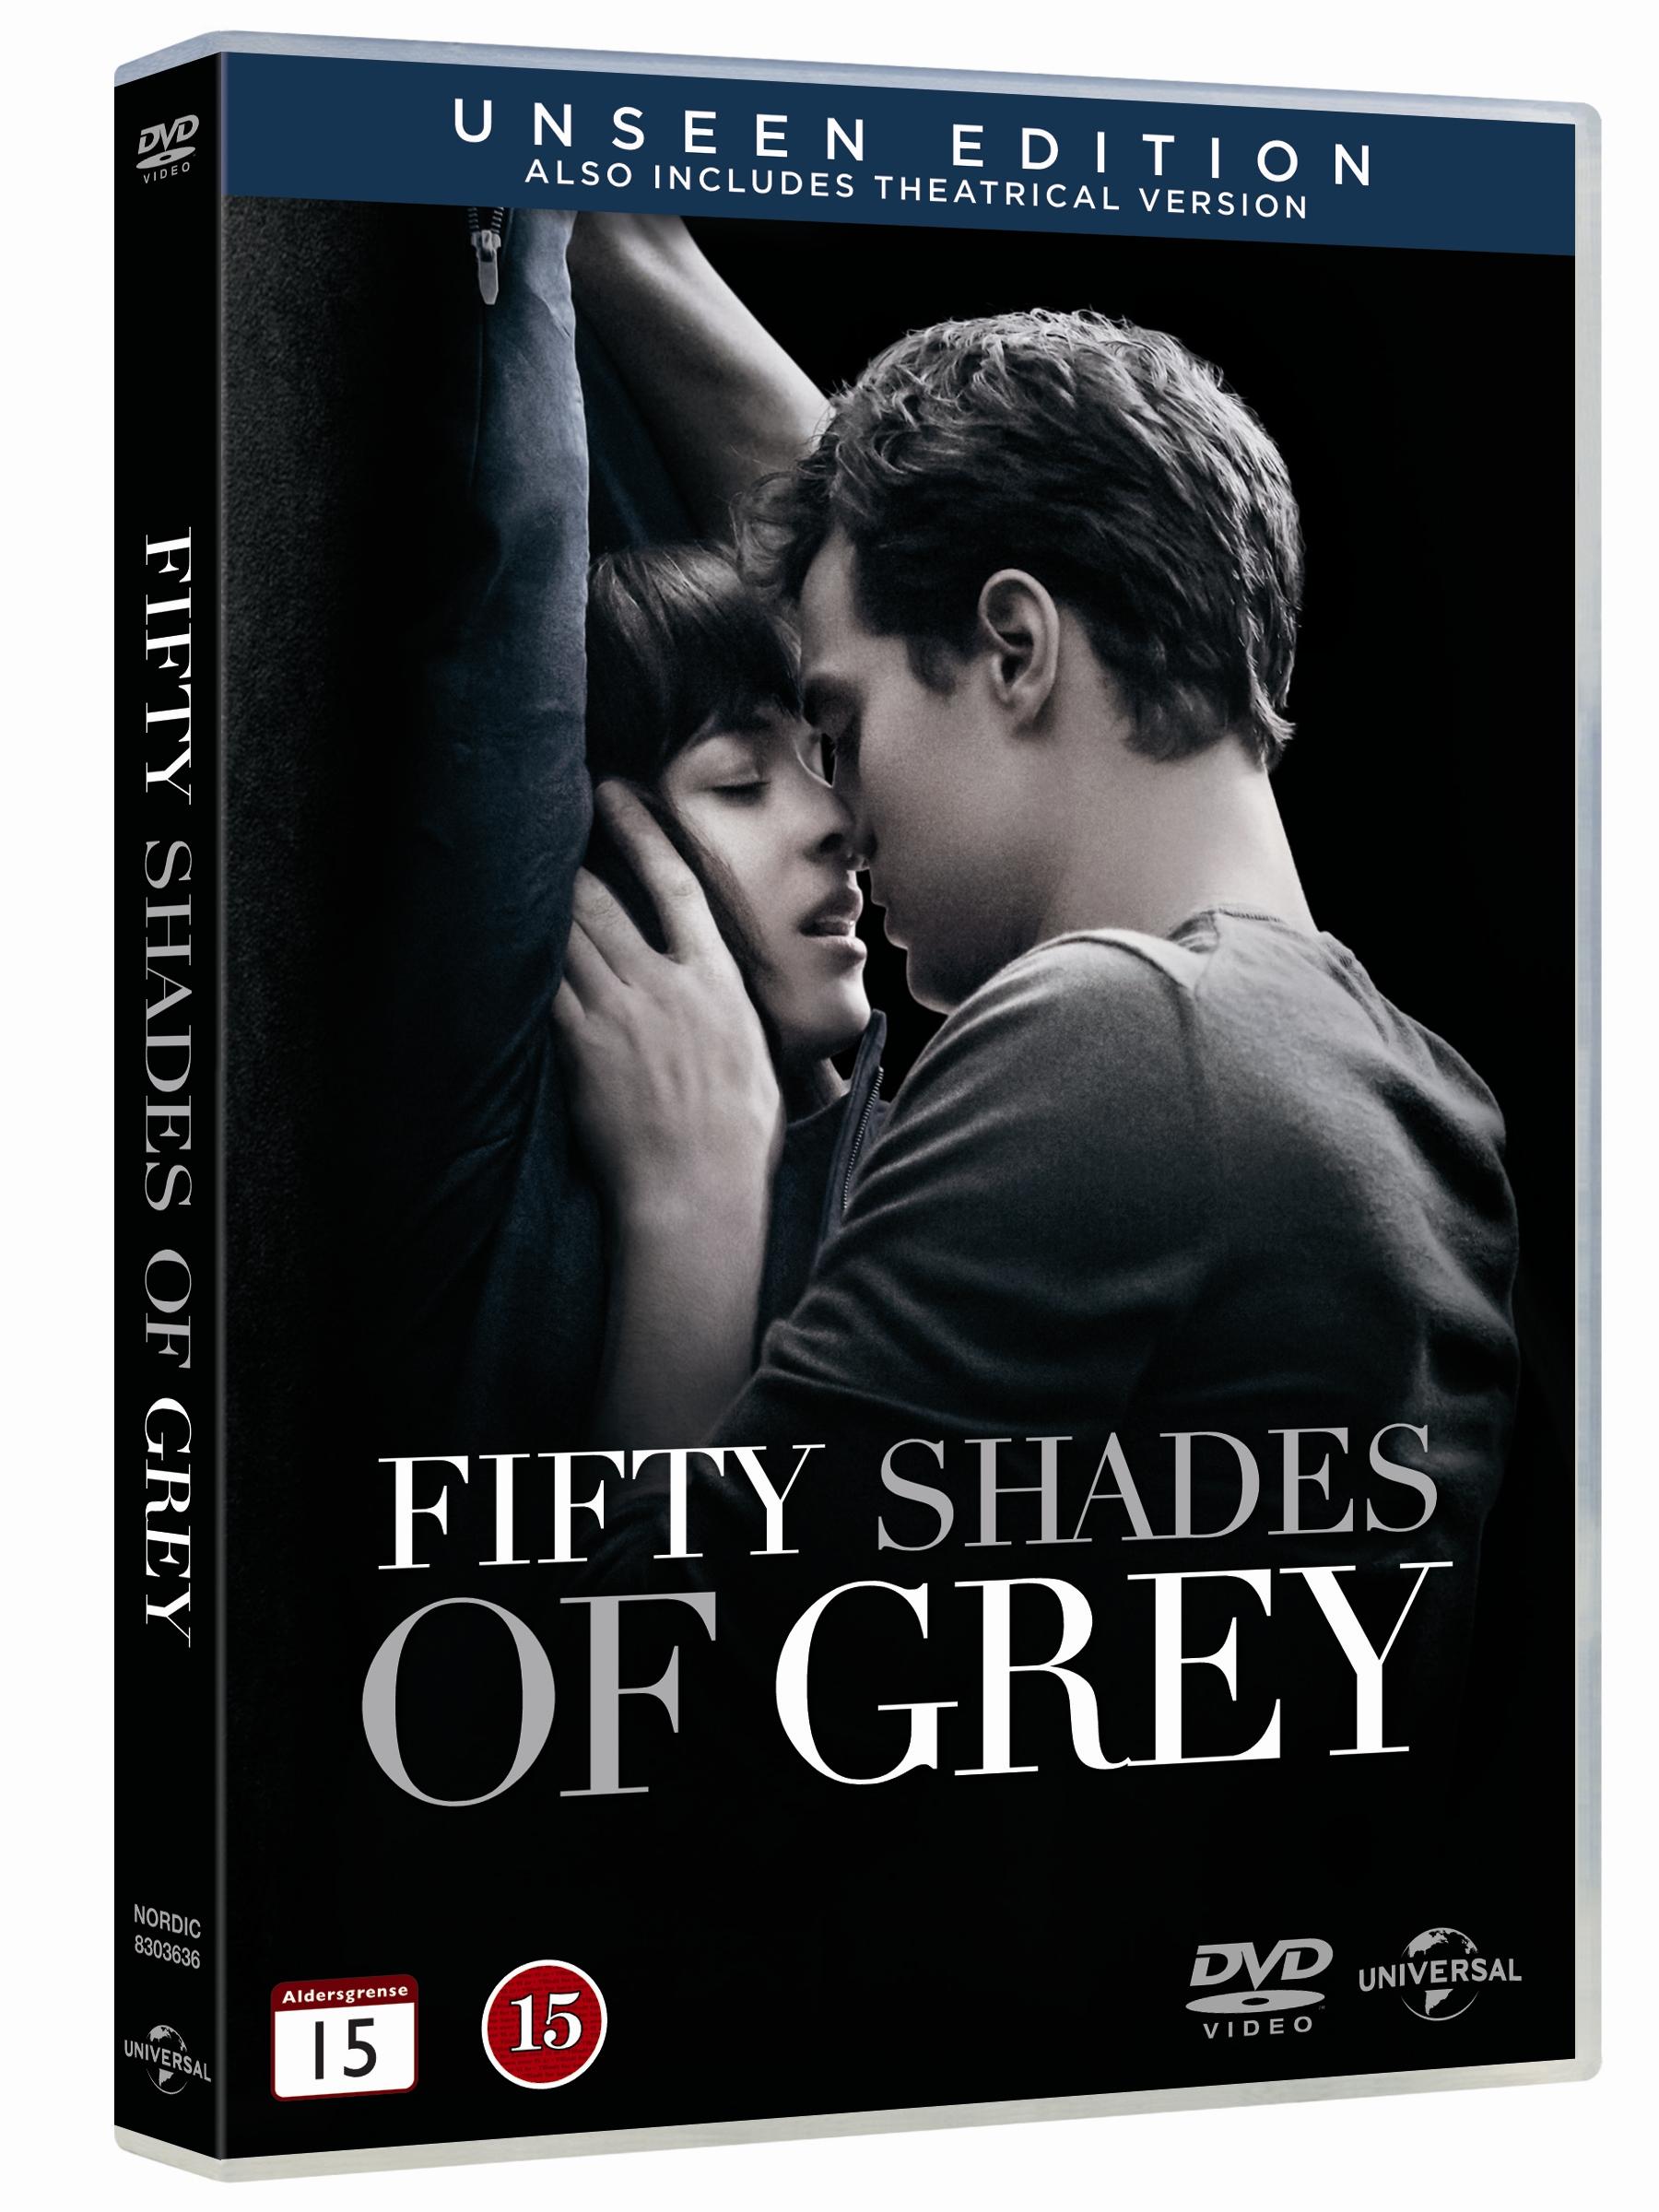 Fifty Shades of Grey - Jamie Dornan - Film - Universal - 5053083036362 - 15/6-2015